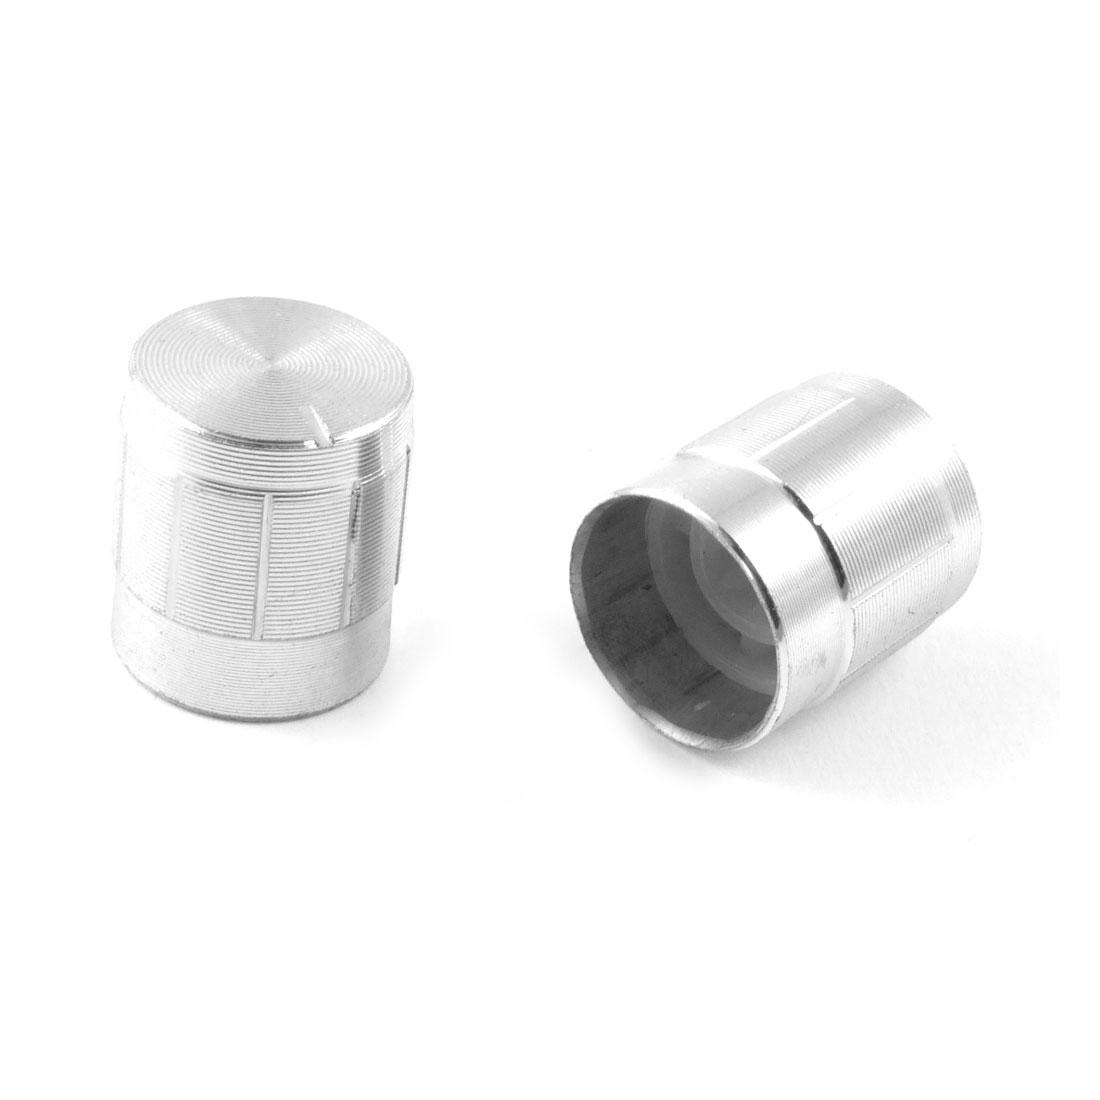 14mm x 16mm Aluminum Silver Tone Potentiometer Knobs 5 Pcs